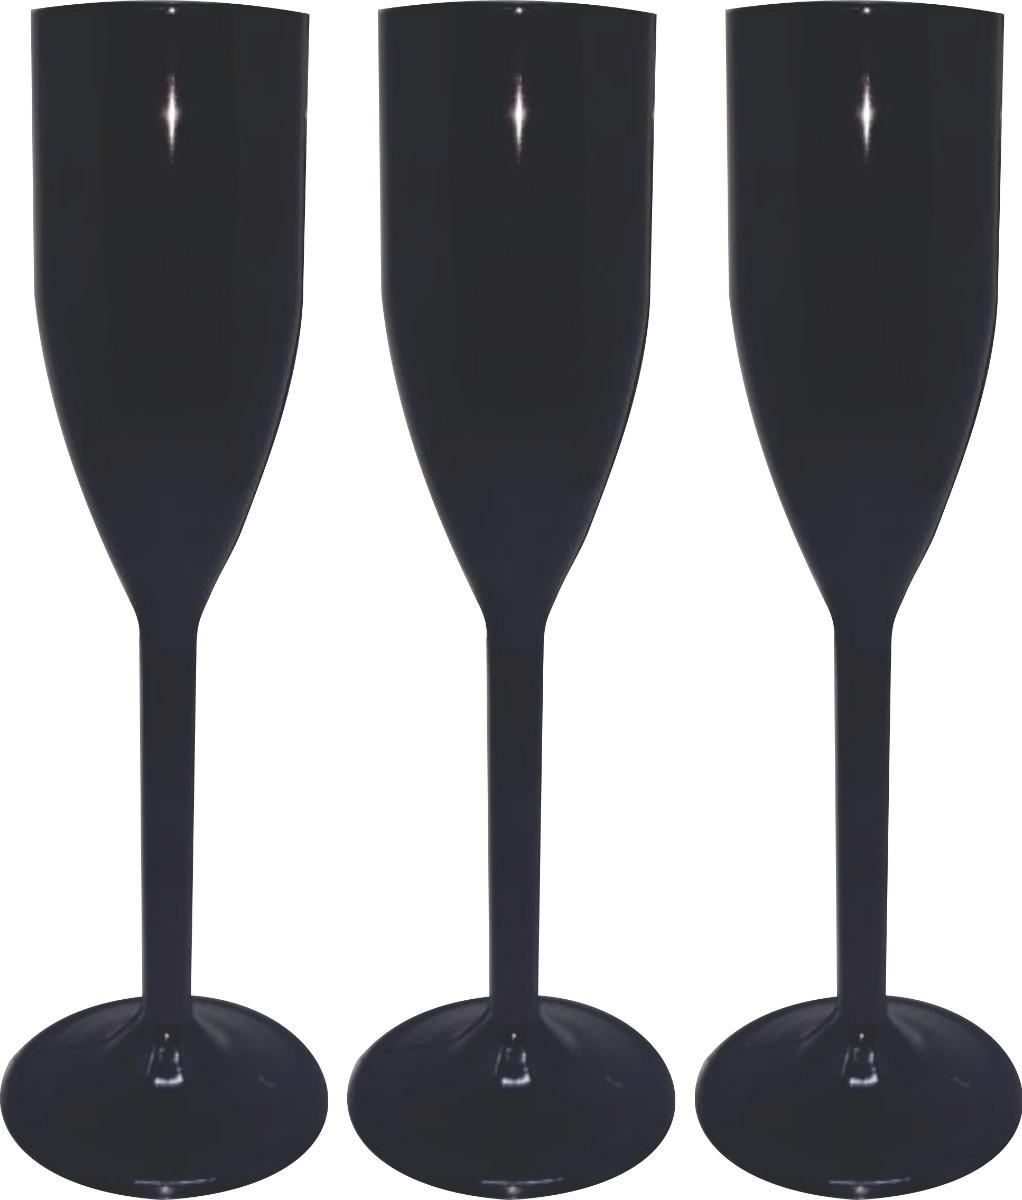 100 Taças Champagne Acrilico Lisas 200 Ml - Preta - R  100 21066e52f2b62